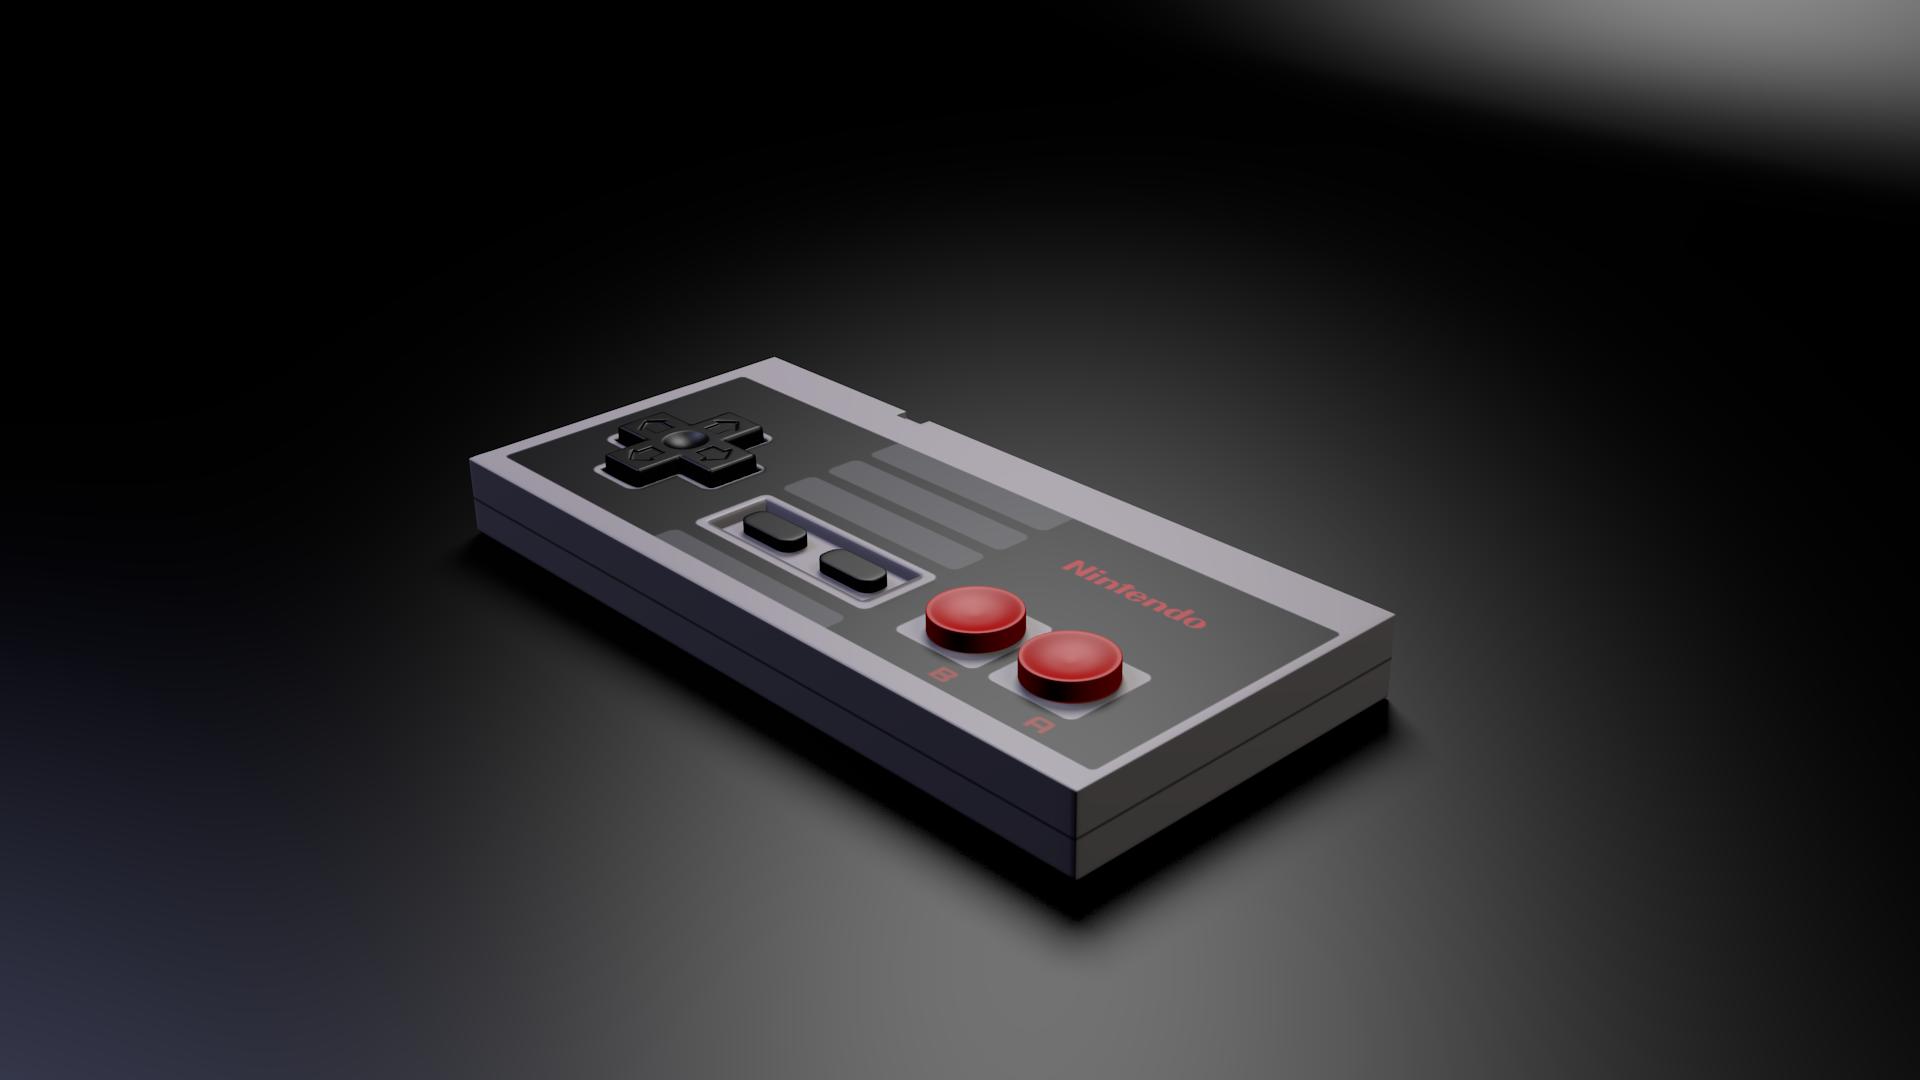 3DNES: rivivi i classici Nintendo in 3D